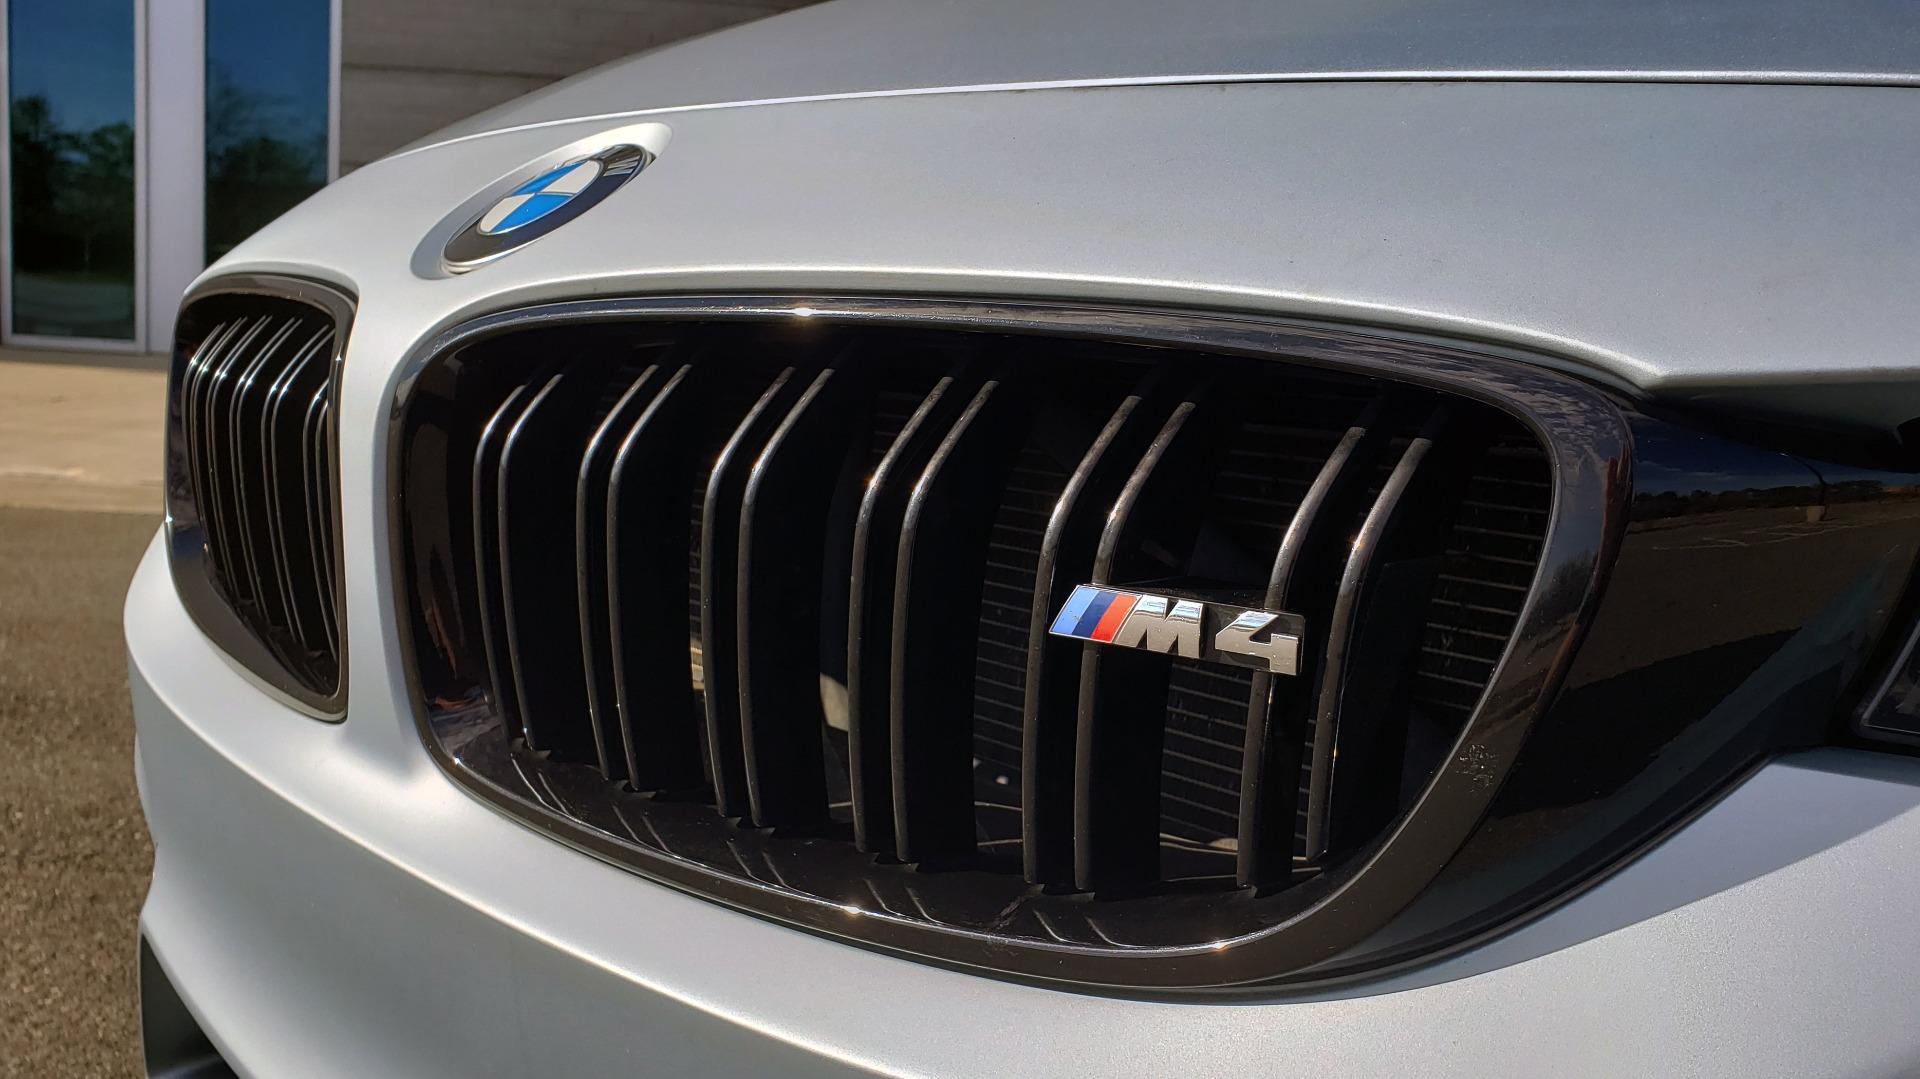 Used 2015 BMW M4 COUPE / EXEC PKG / DRVR ASST PLUS / LIGHTING / M-SUSPENSION for sale Sold at Formula Imports in Charlotte NC 28227 29